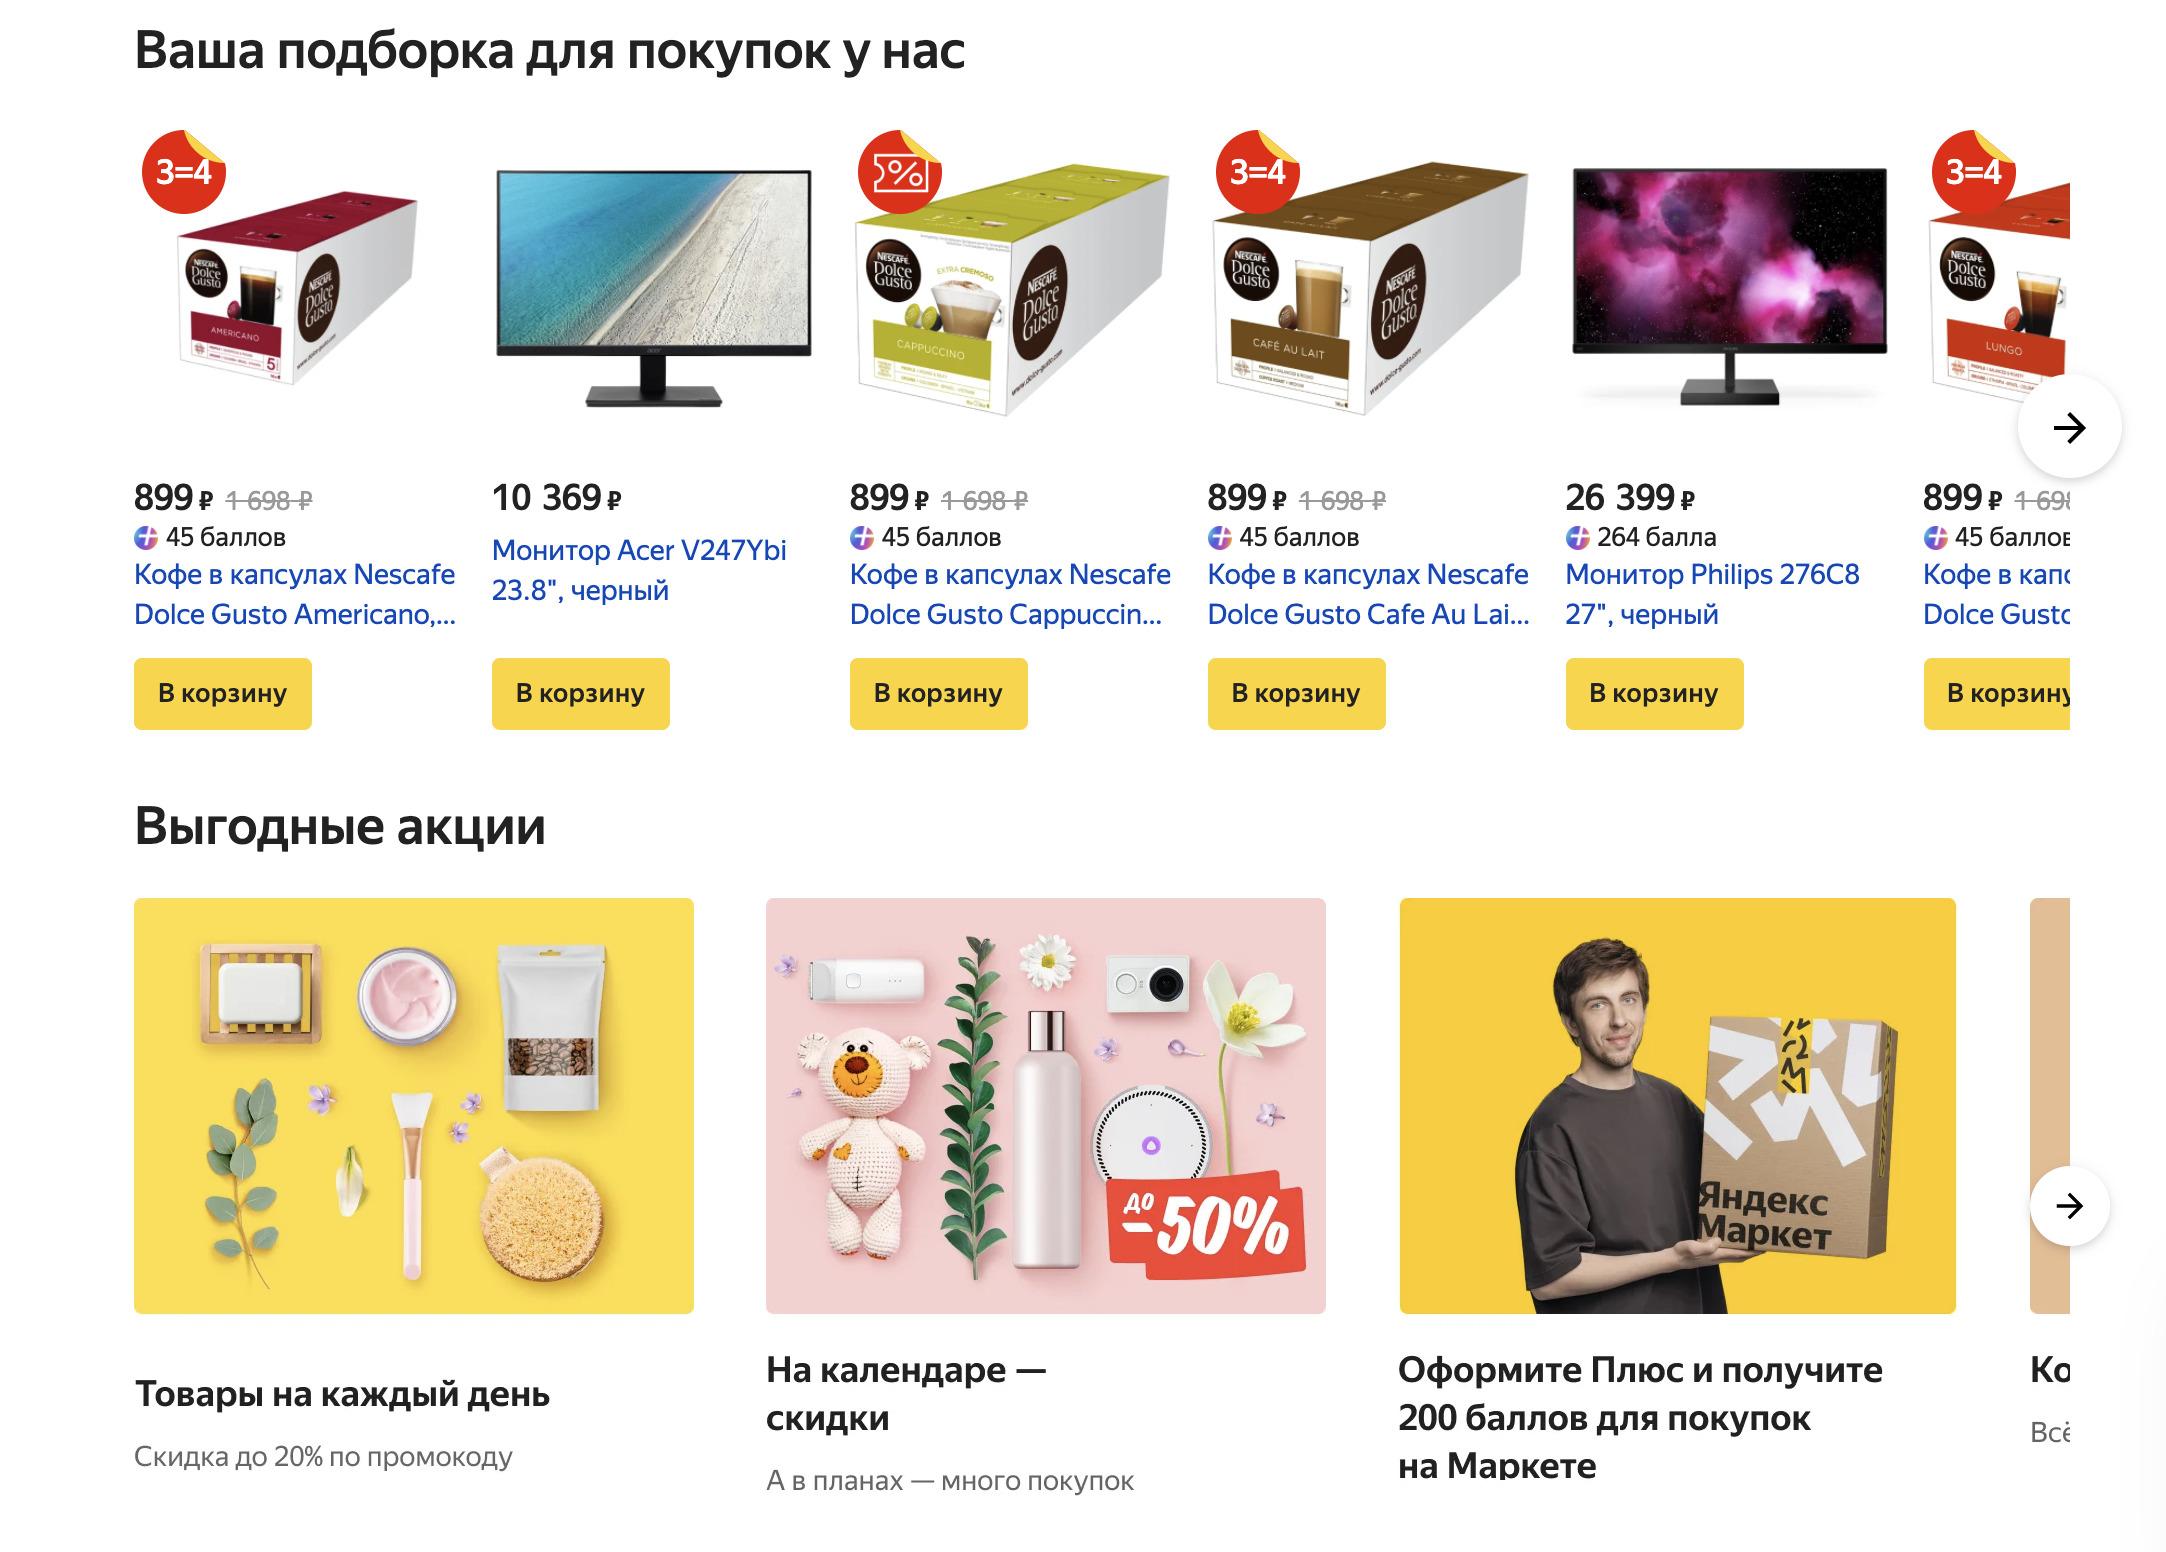 Доставка из Яндекс.Маркет в Азов, сроки, пункты выдачи, каталог